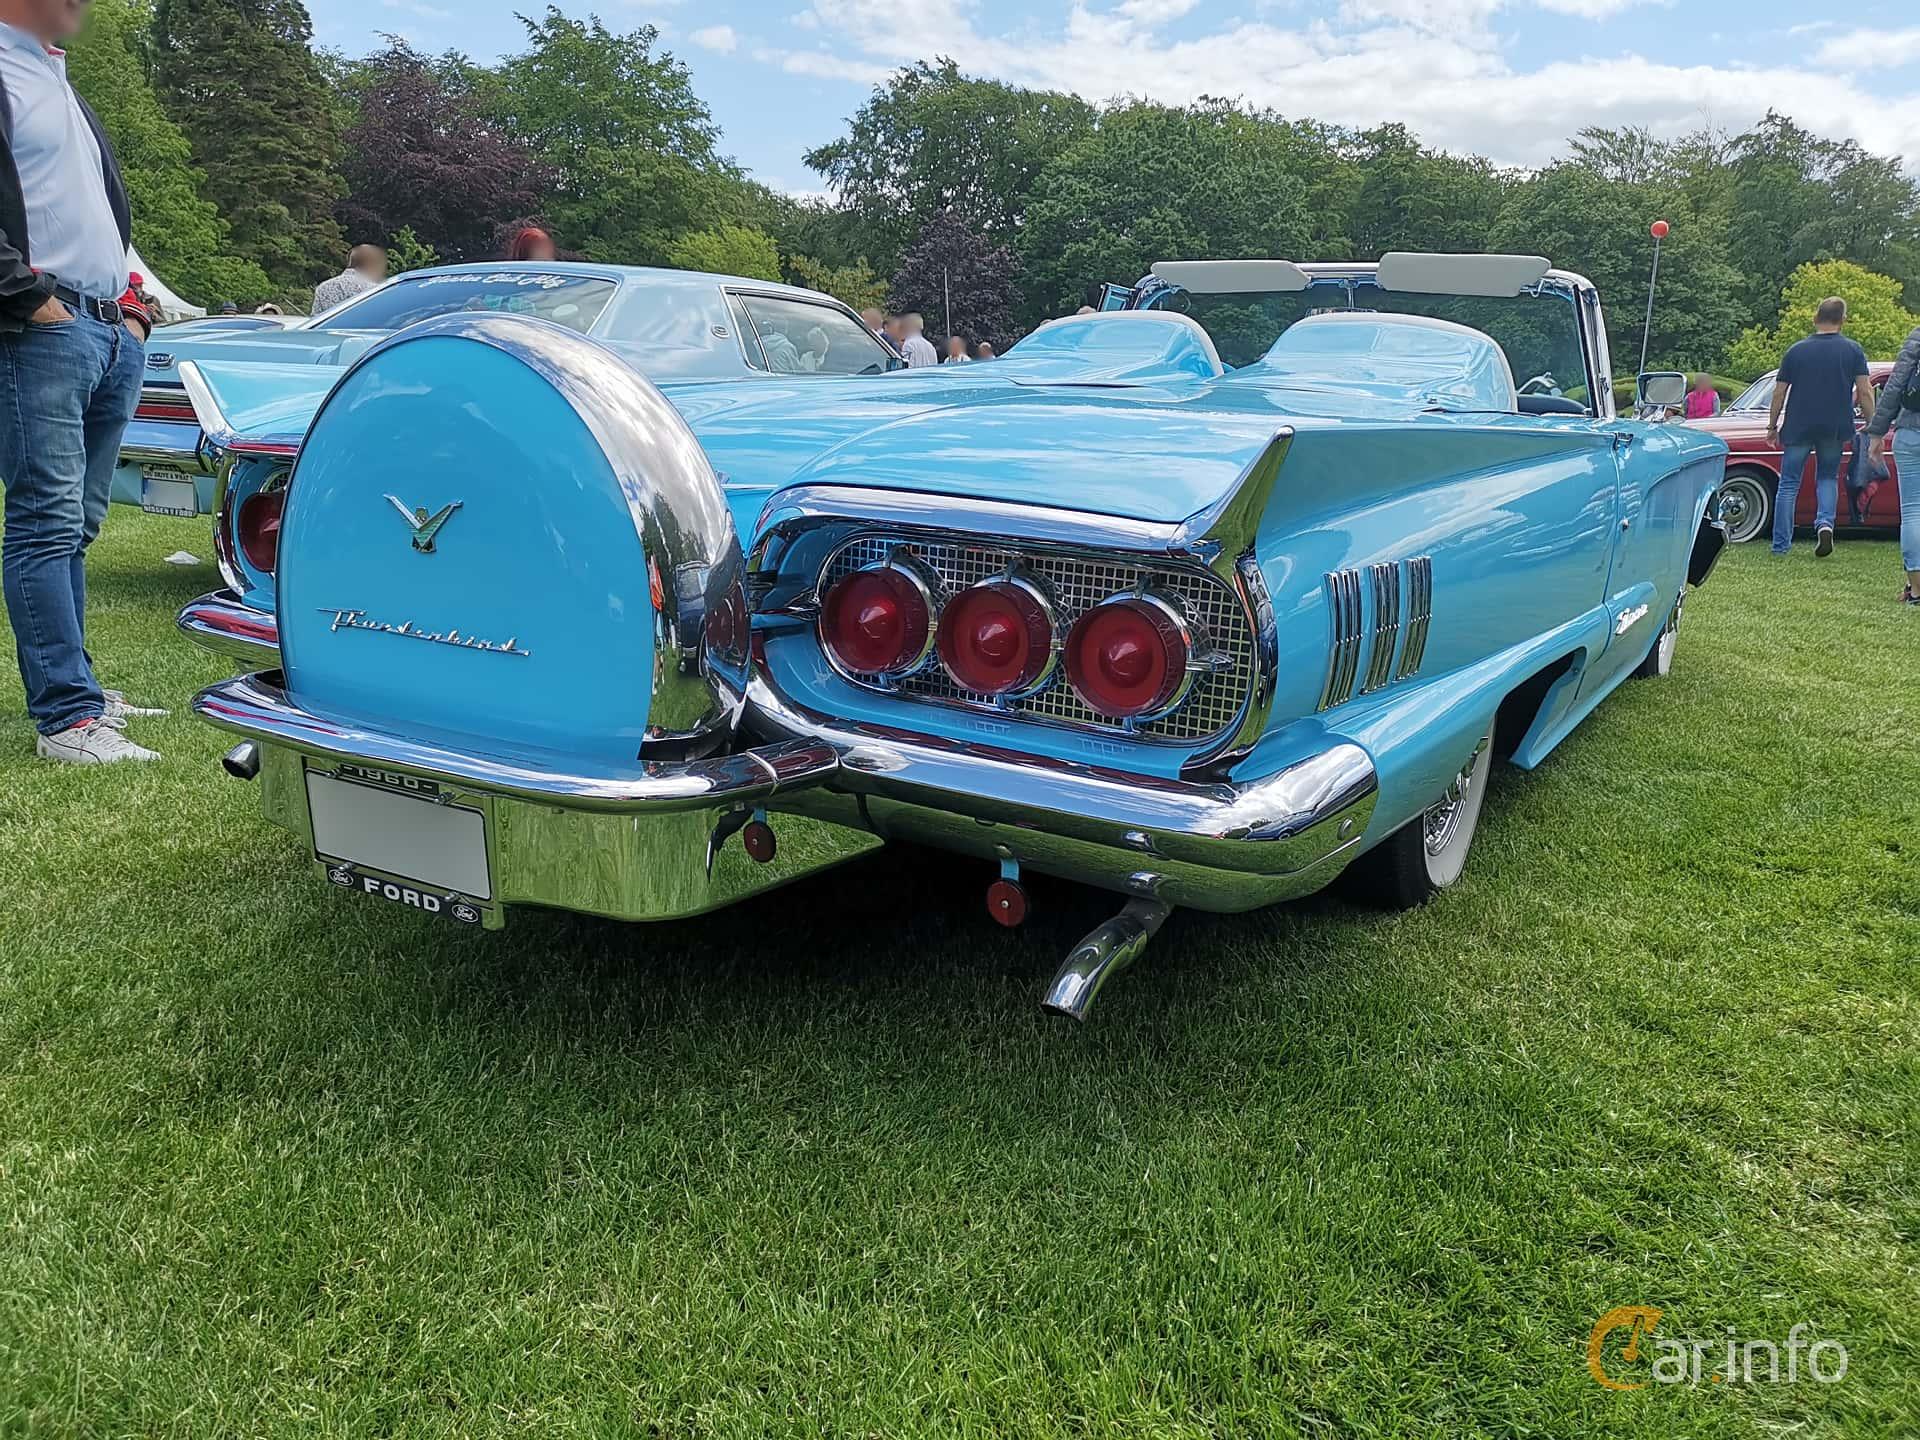 Ford Thunderbird Convertible 5.8 V8 Automatic, 305hp, 1960 at Sofiero Classic 2019